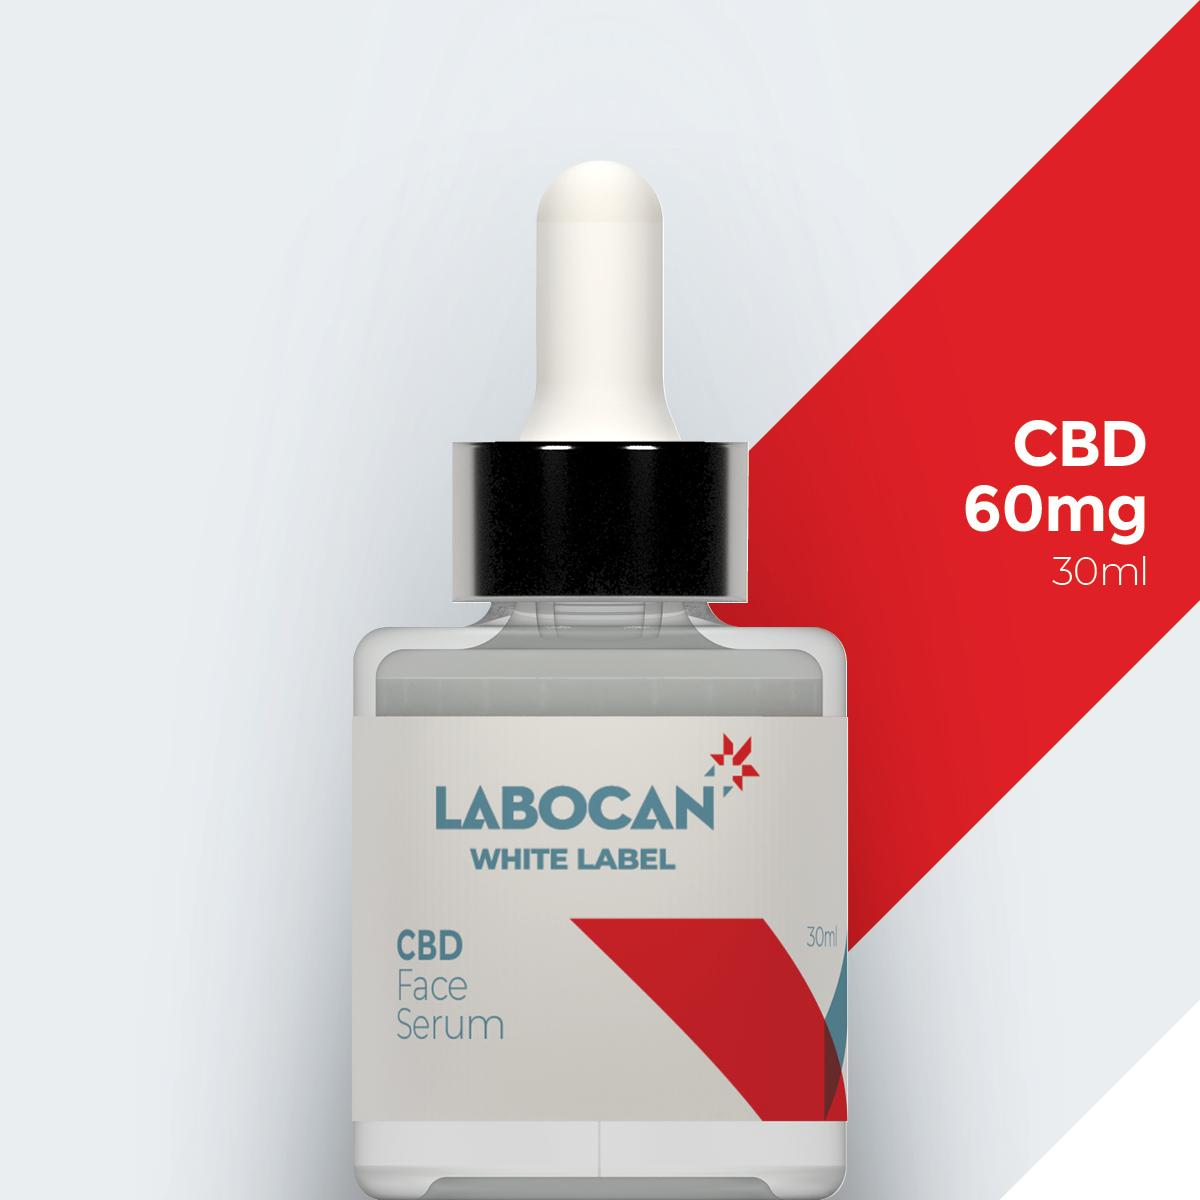 Labocan White label CBD Face Serum